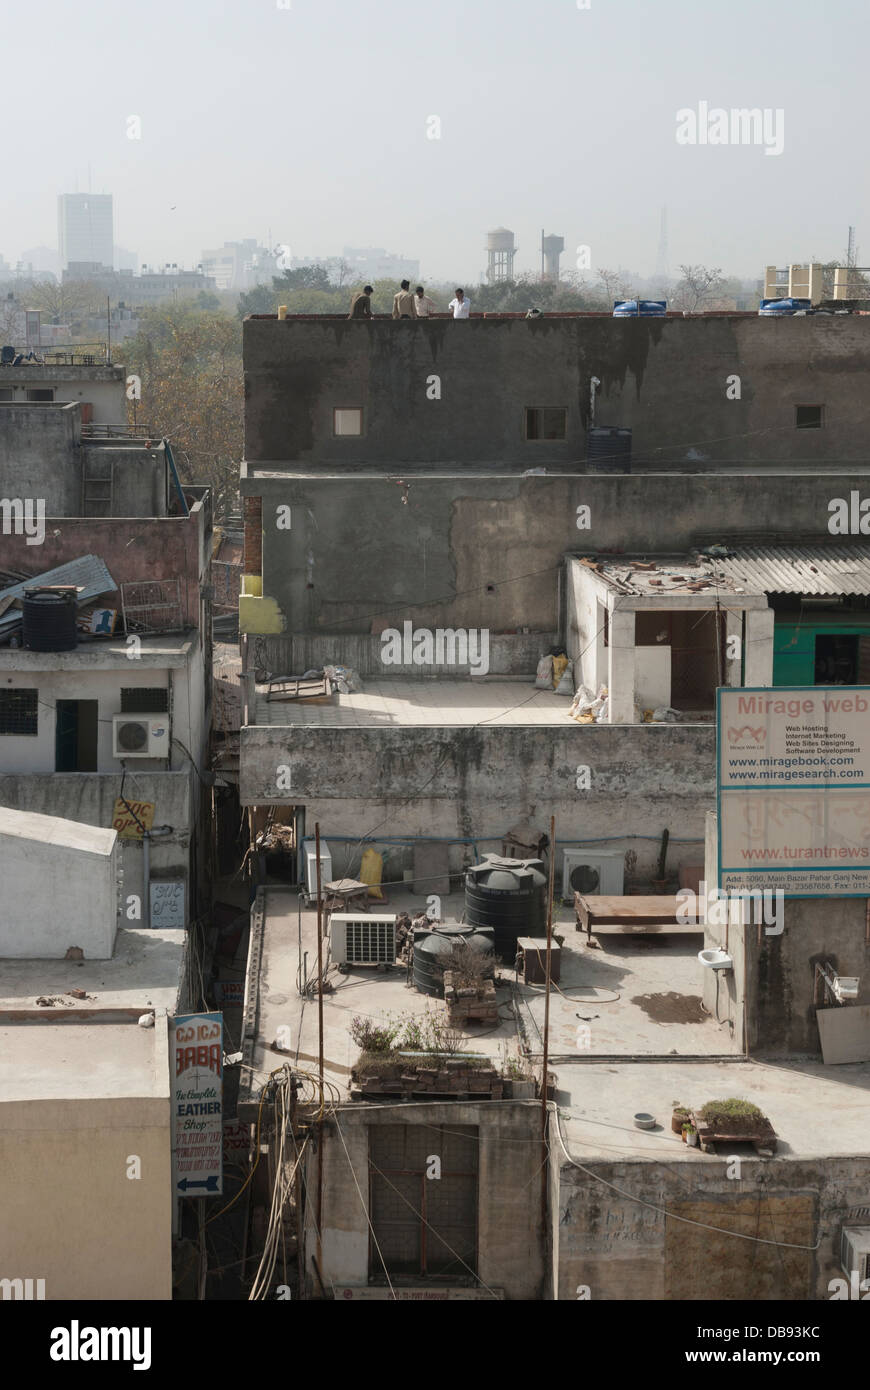 Paharganj, Delhi, India. 23rd March 2012. Delhi skyline looking over resident rooftops. - Stock Image